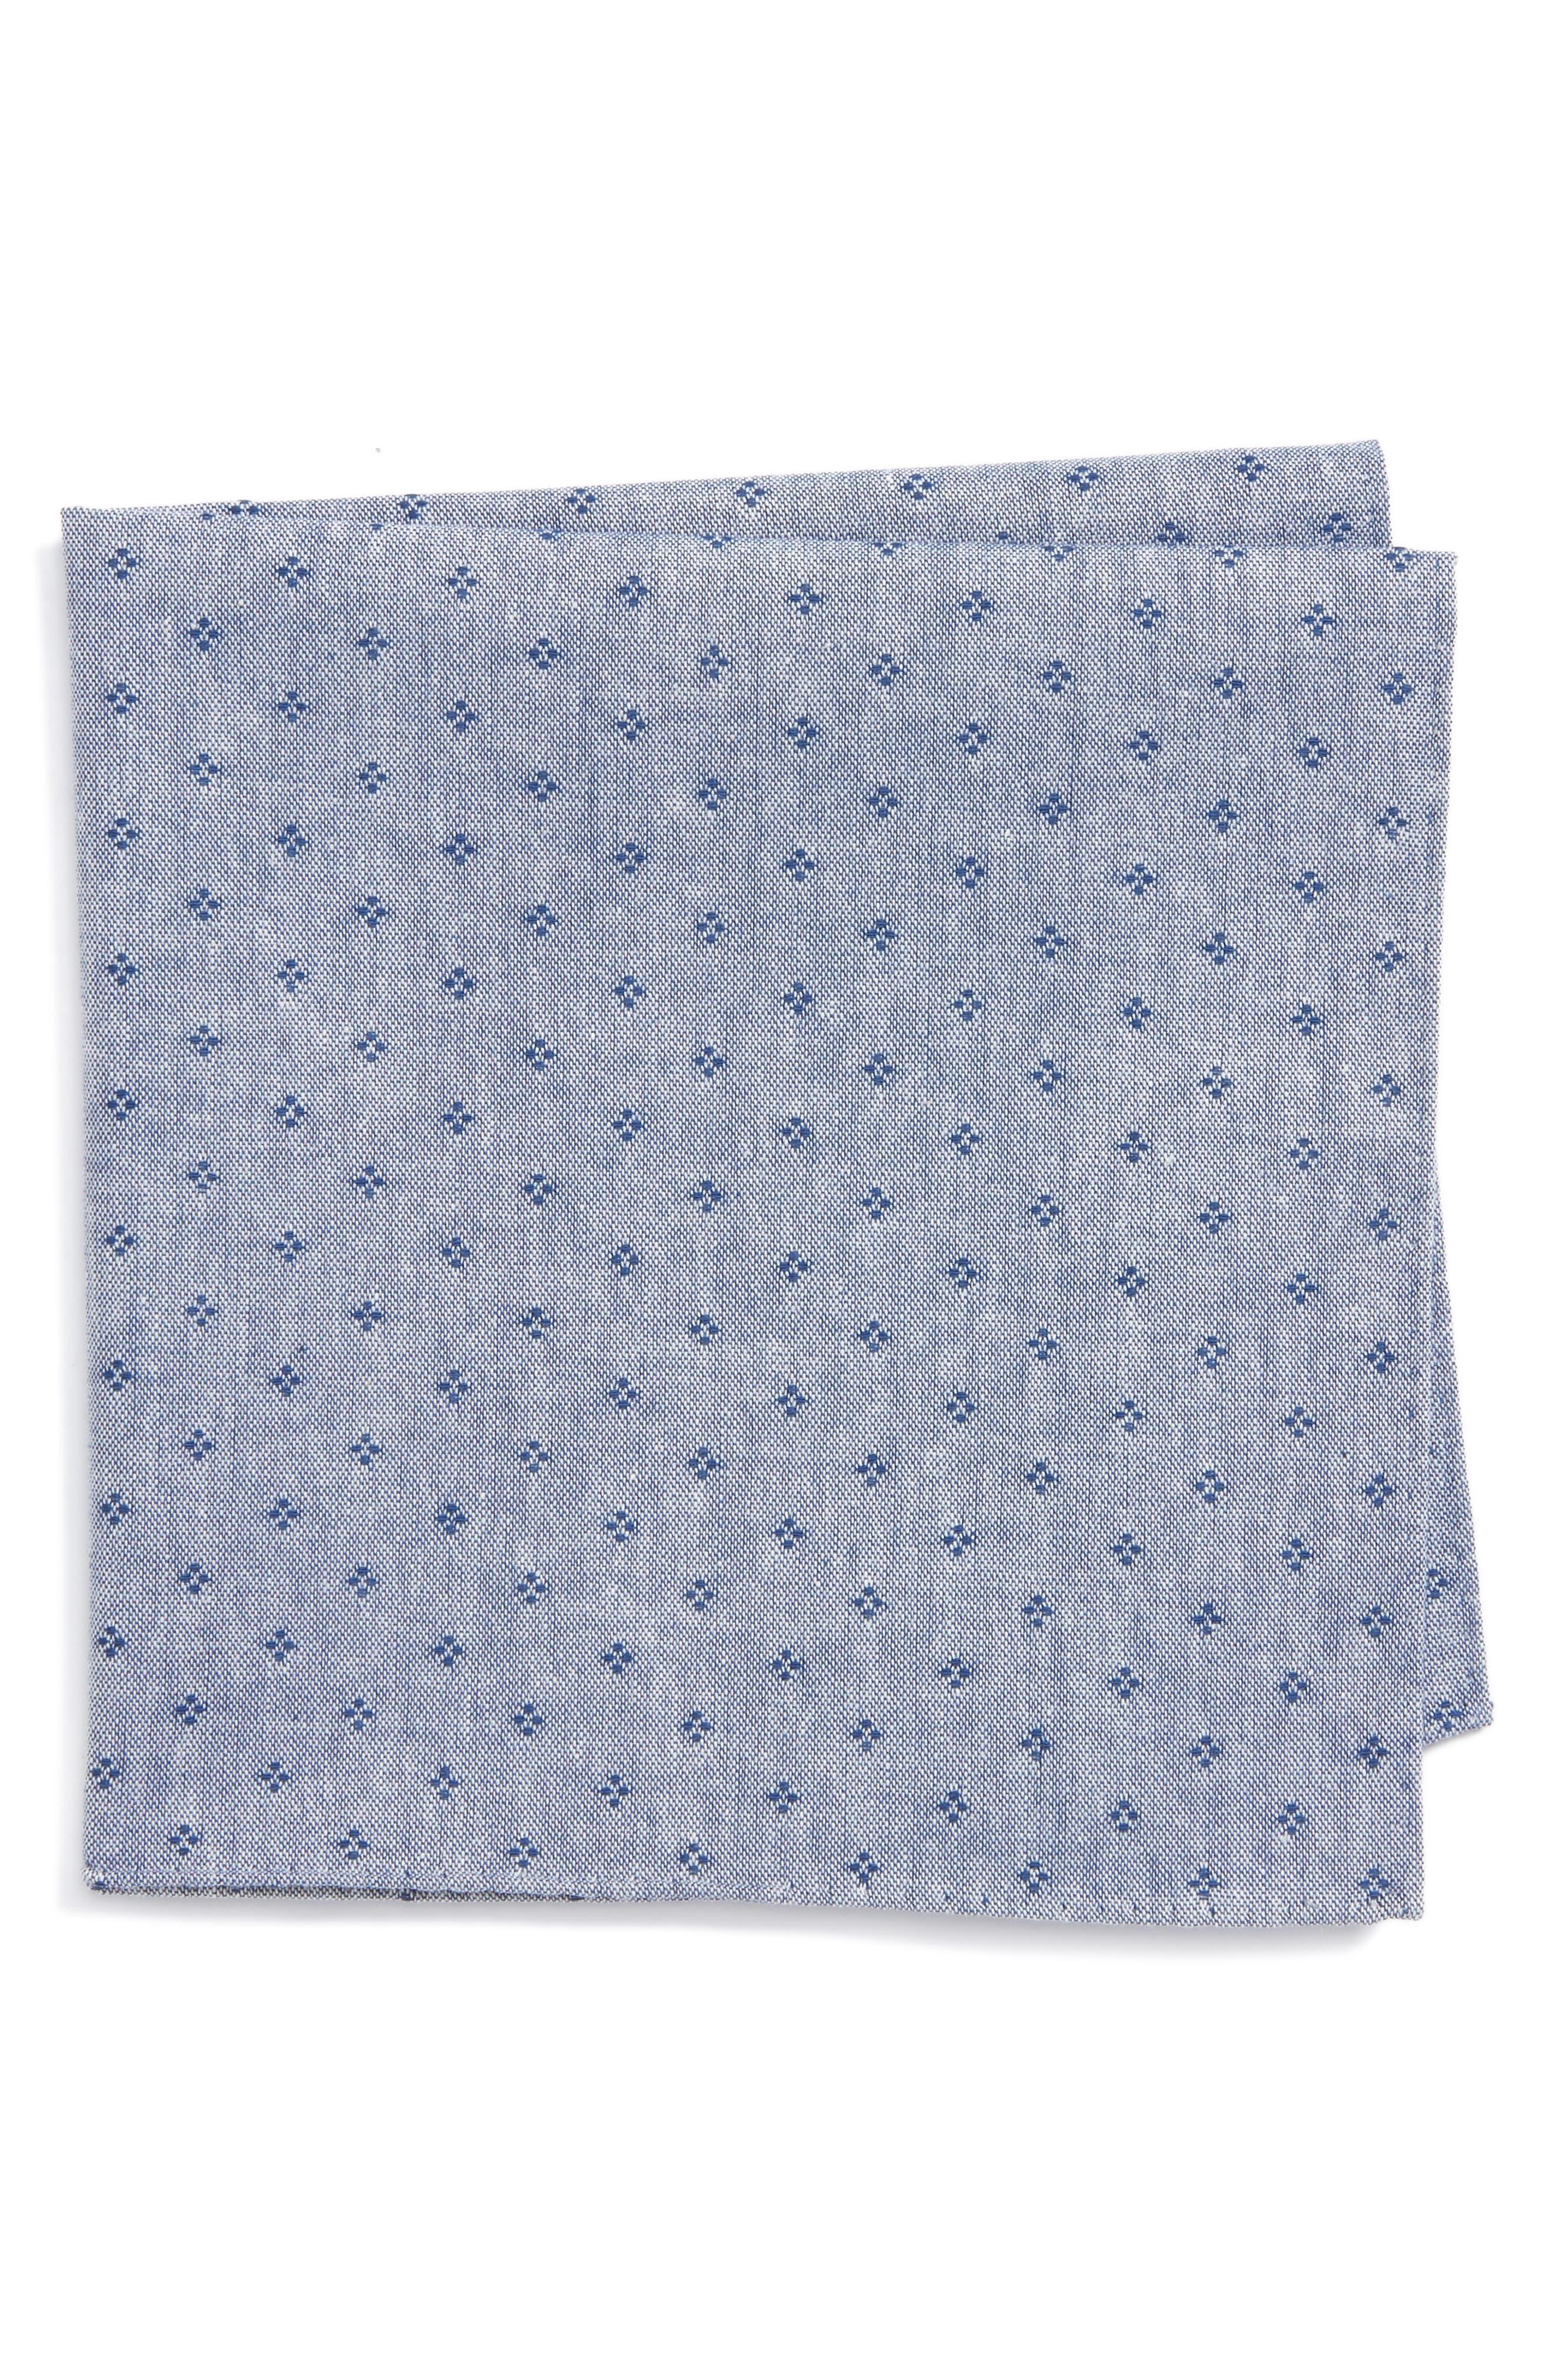 Nordstrom Men's Shop Rulli Dot Cotton Pocket Square